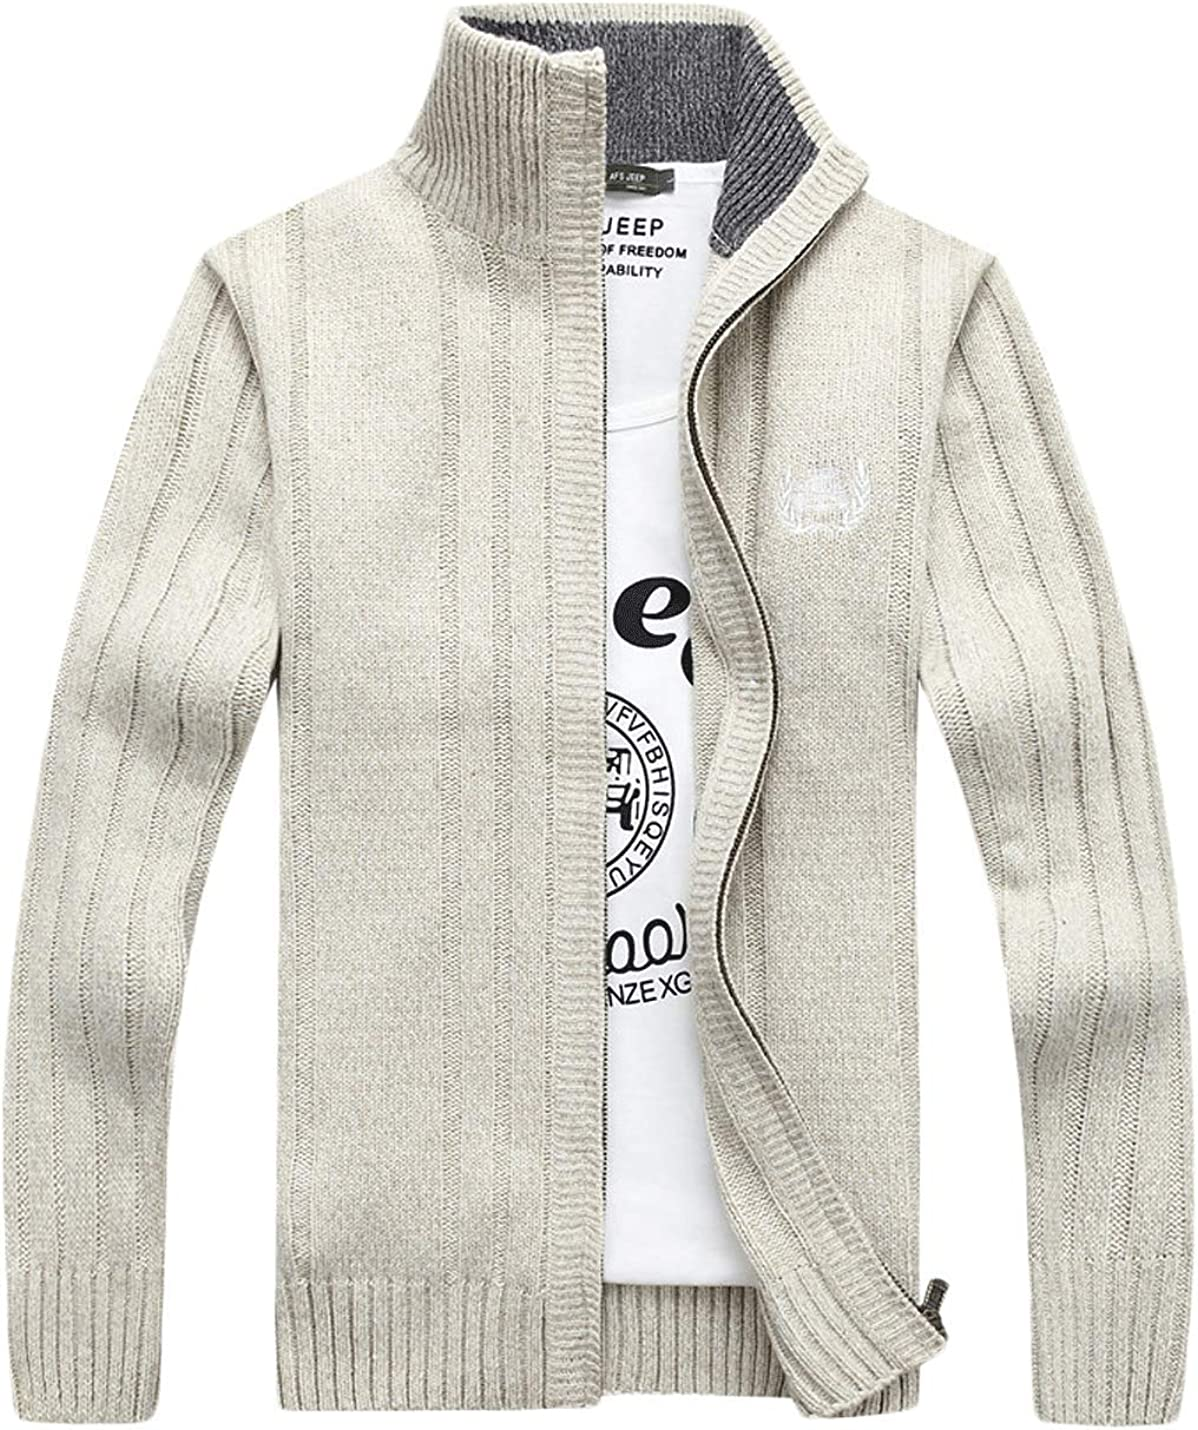 Jenkoon Mens Casual Stand Collar Full Zip Cardigan Sweater